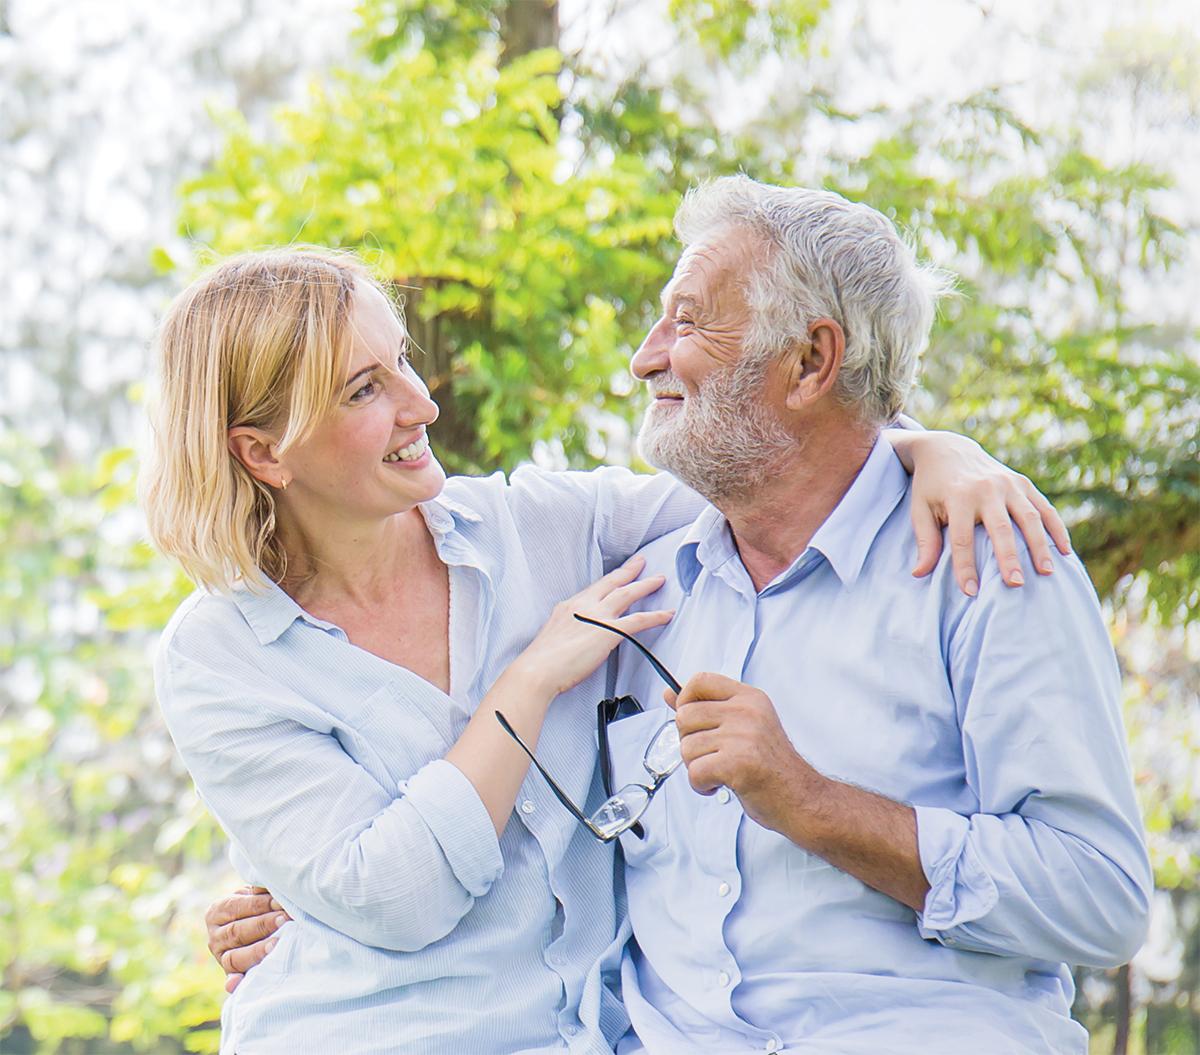 Showcasing Senior Living Community Experiences